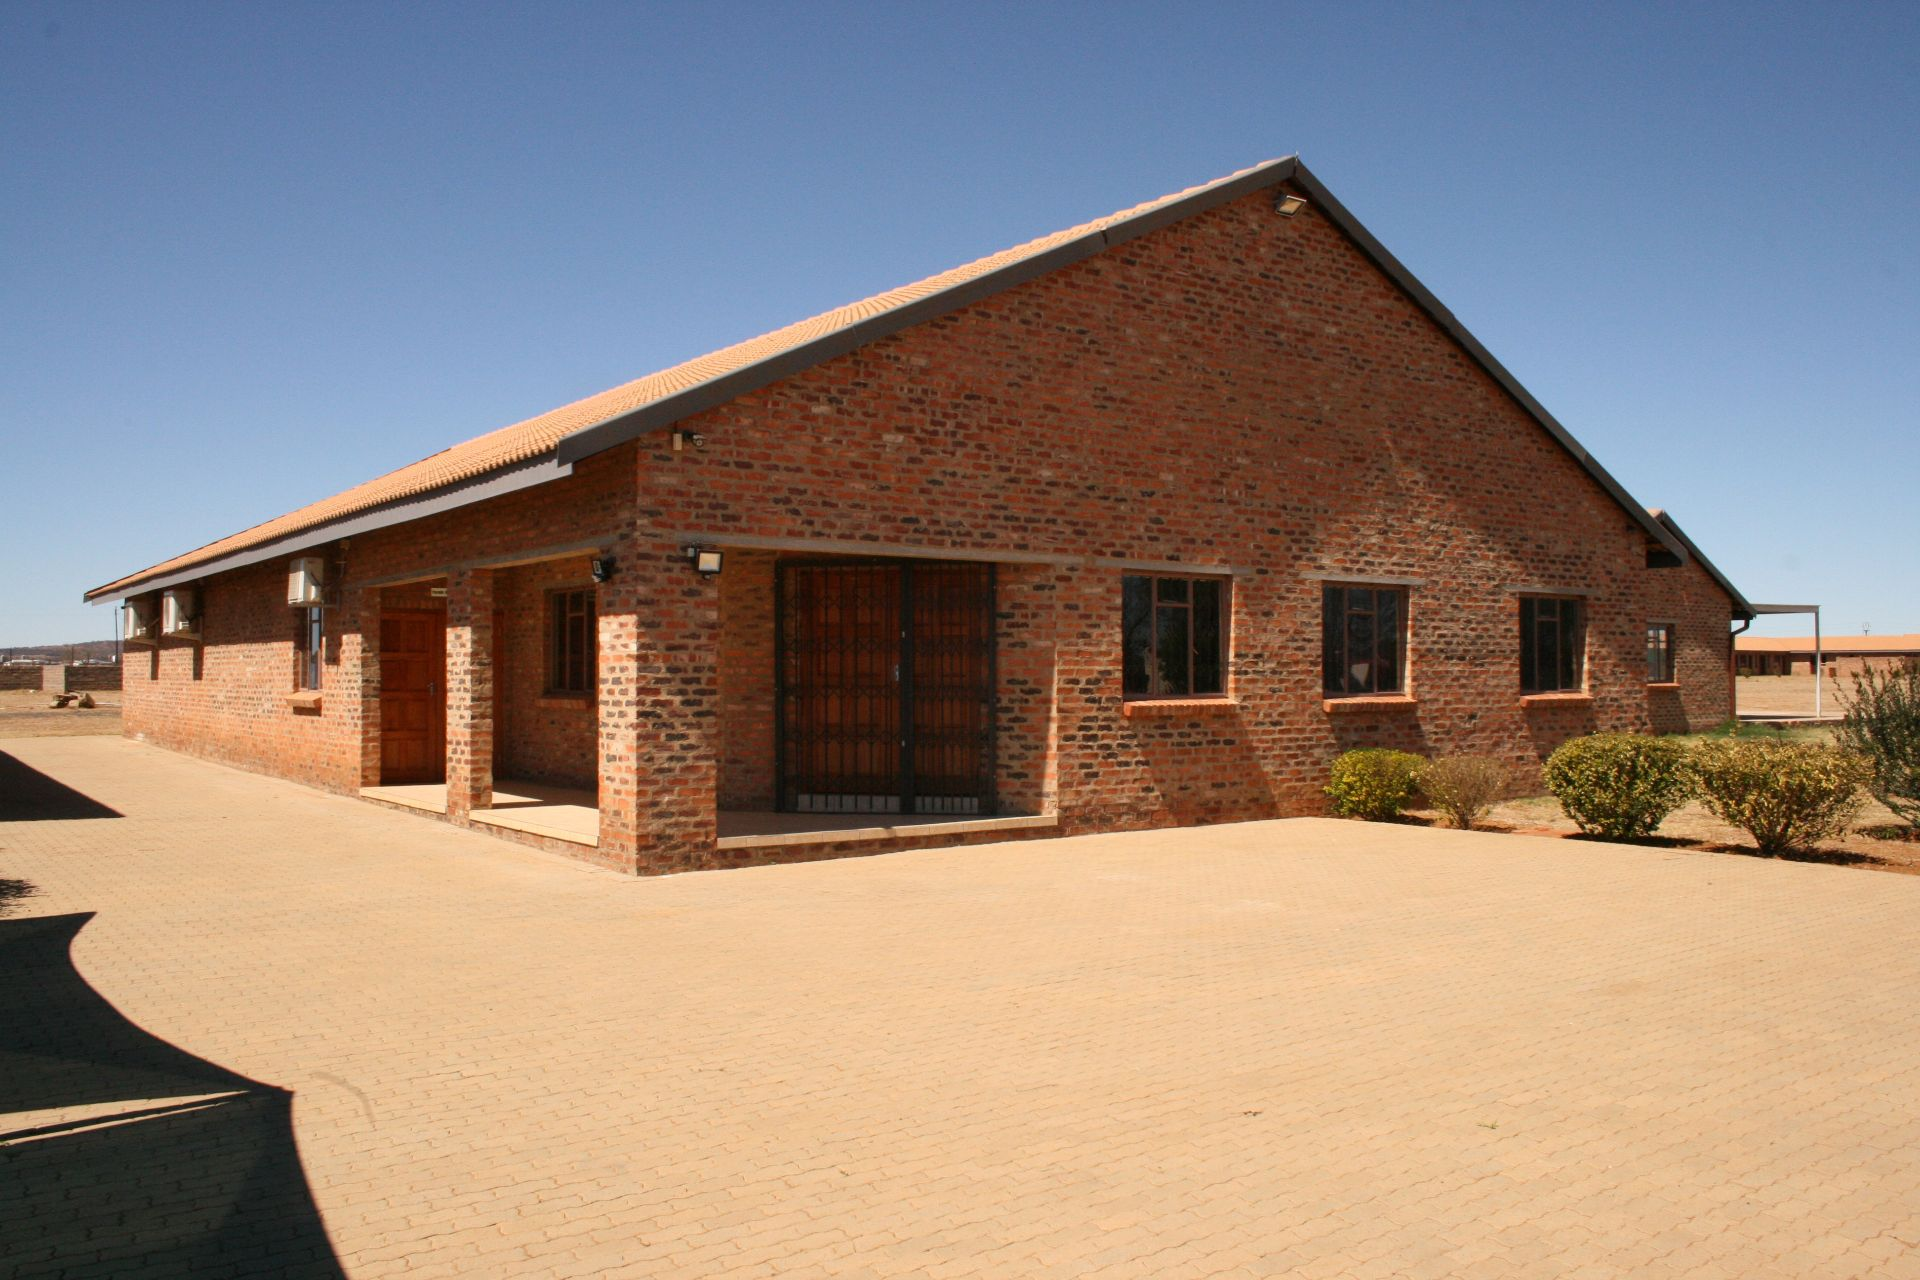 Potchefstroom, Vyfhoek Property  | Houses For Sale Vyfhoek, VYFHOEK, Commercial  property for sale Price:4,700,000